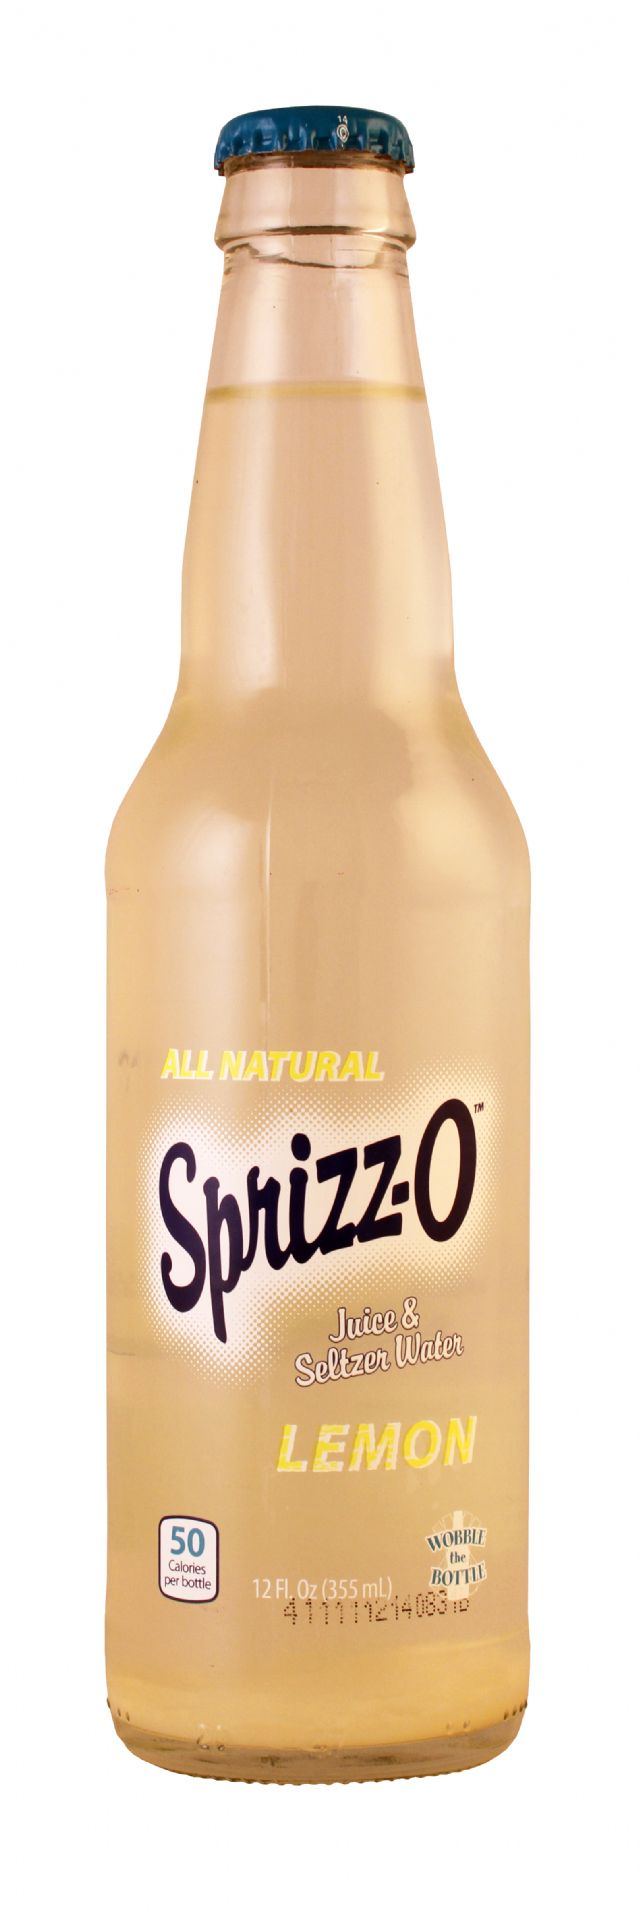 Sprizz-O: Sprizzo Lemon Front